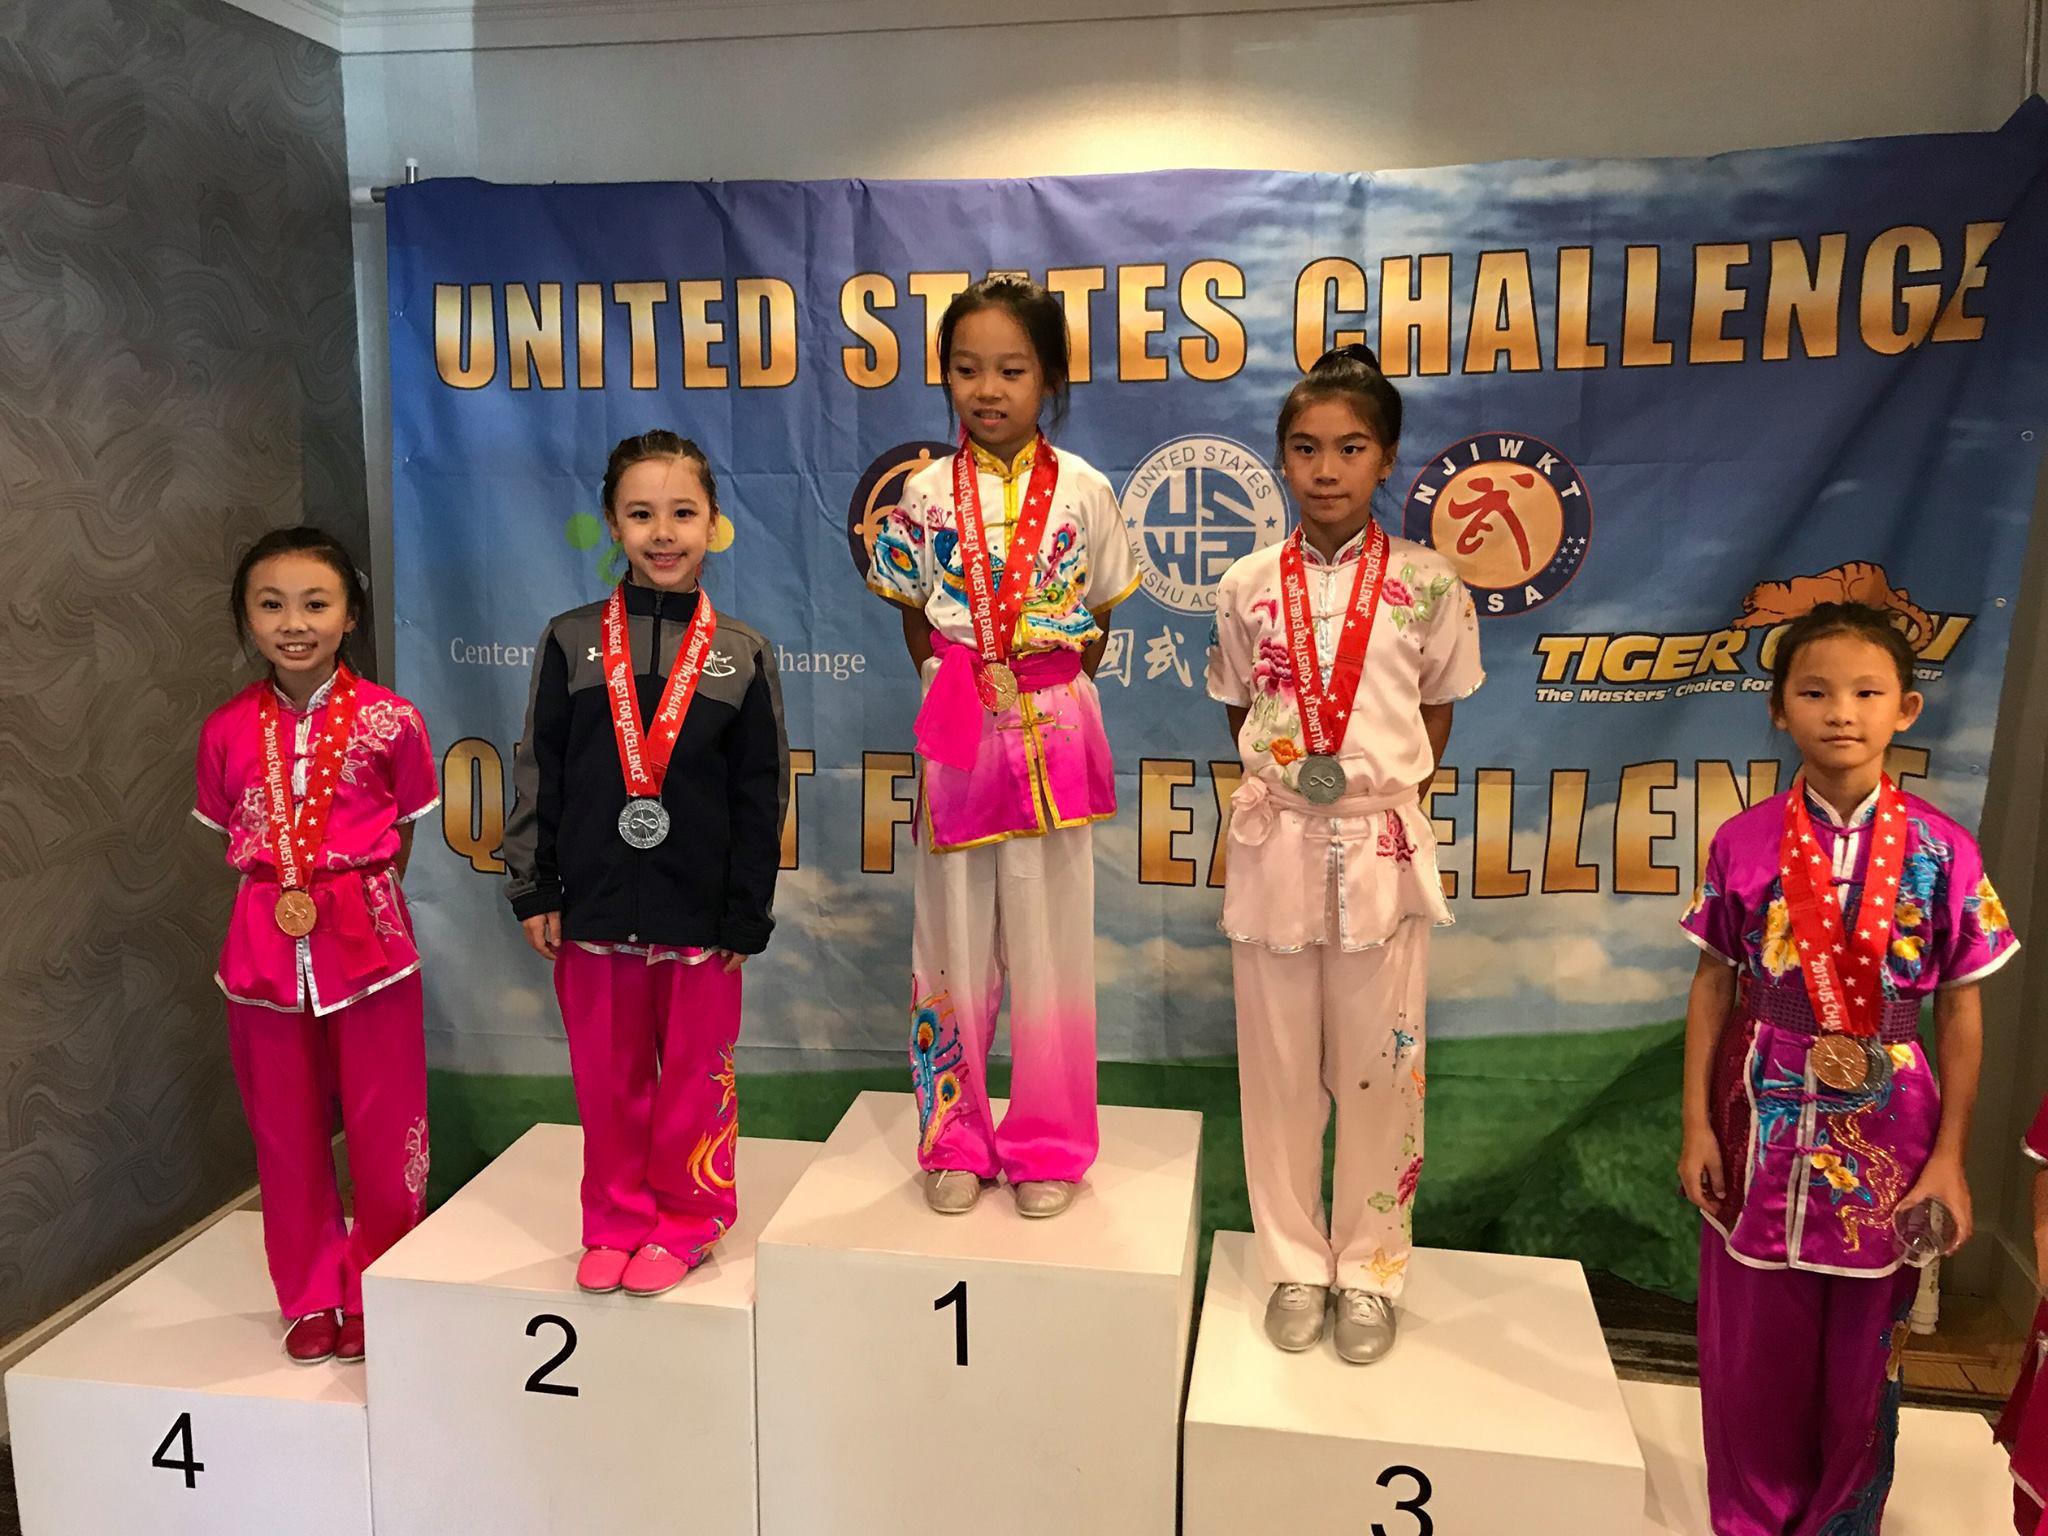 wayland-li-wushu-us-challenge-competition-maryland-2017-49.jpg